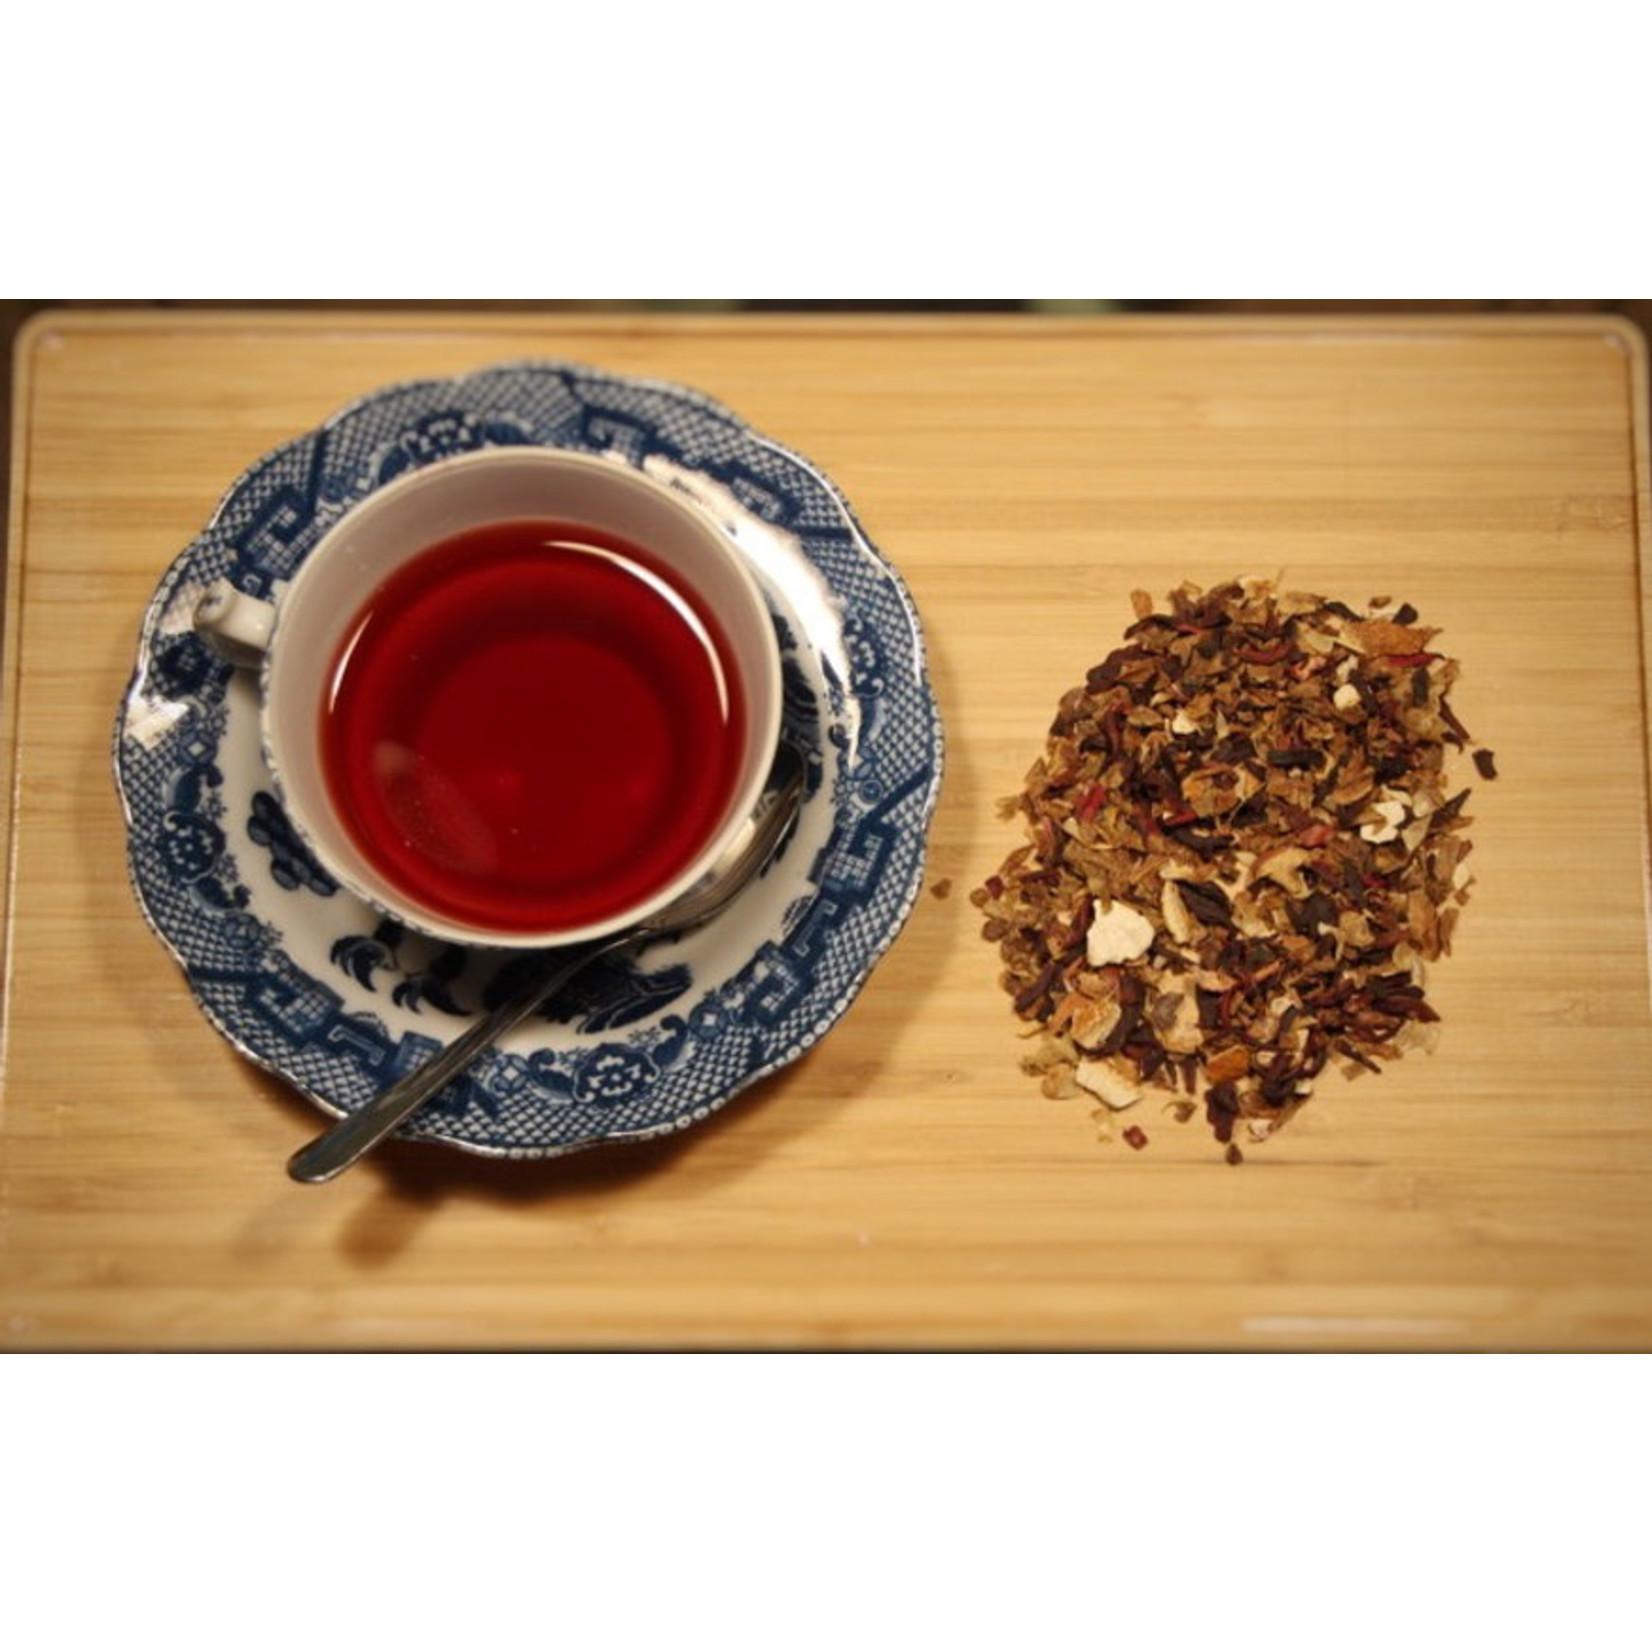 Rode thee 'opgewekt' (100gr)